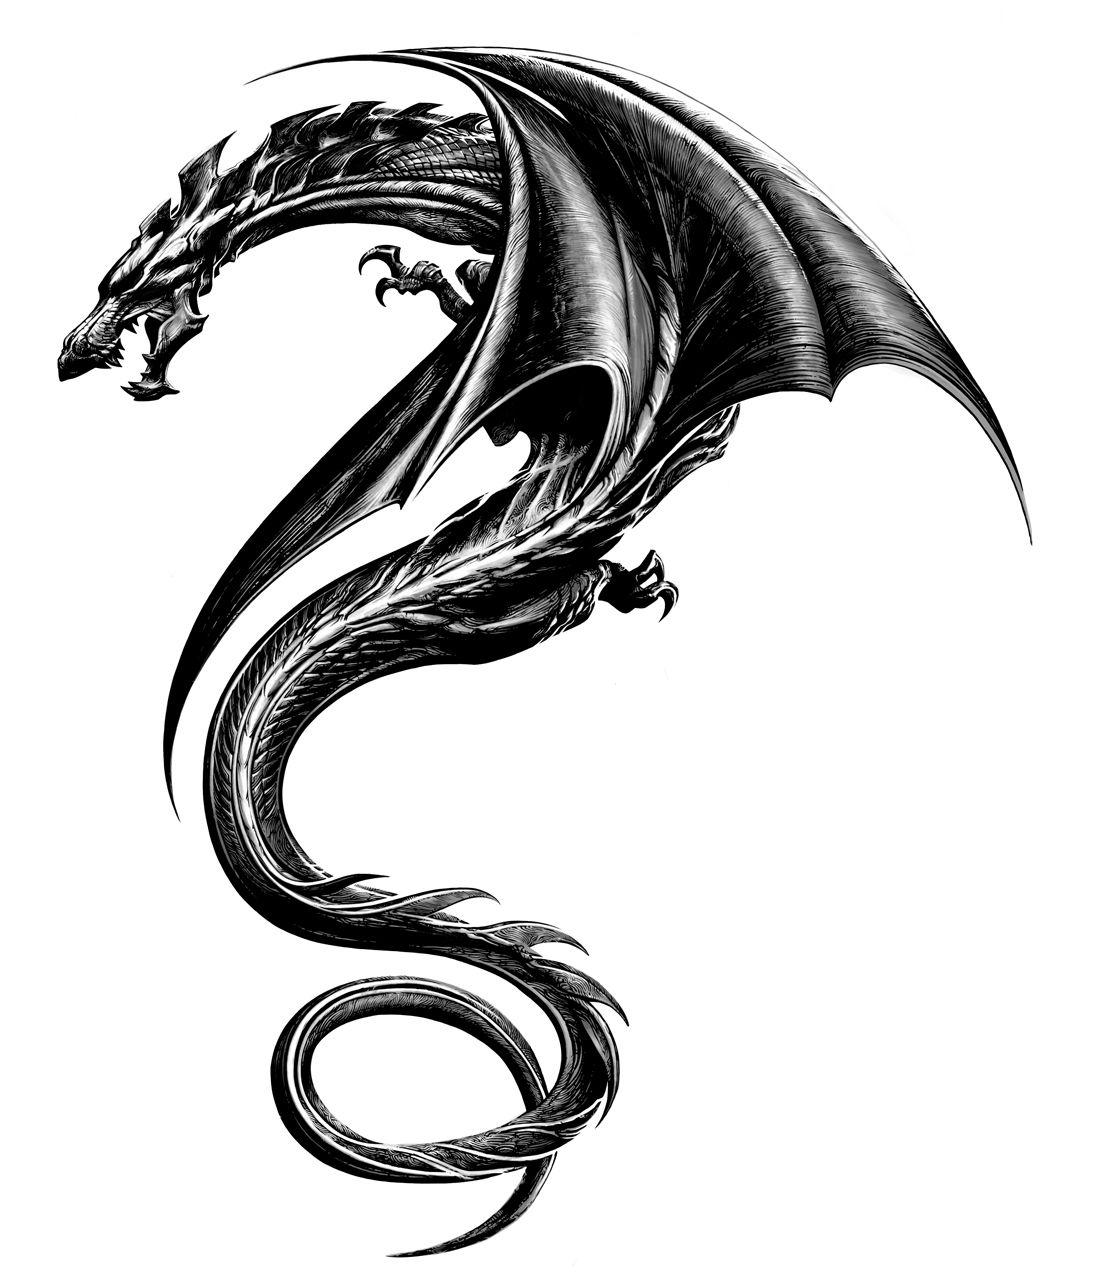 The Girl With The Dragon Tattoo Dragon Tattoo Dragon Tattoo Designs Tribal Dragon Tattoos